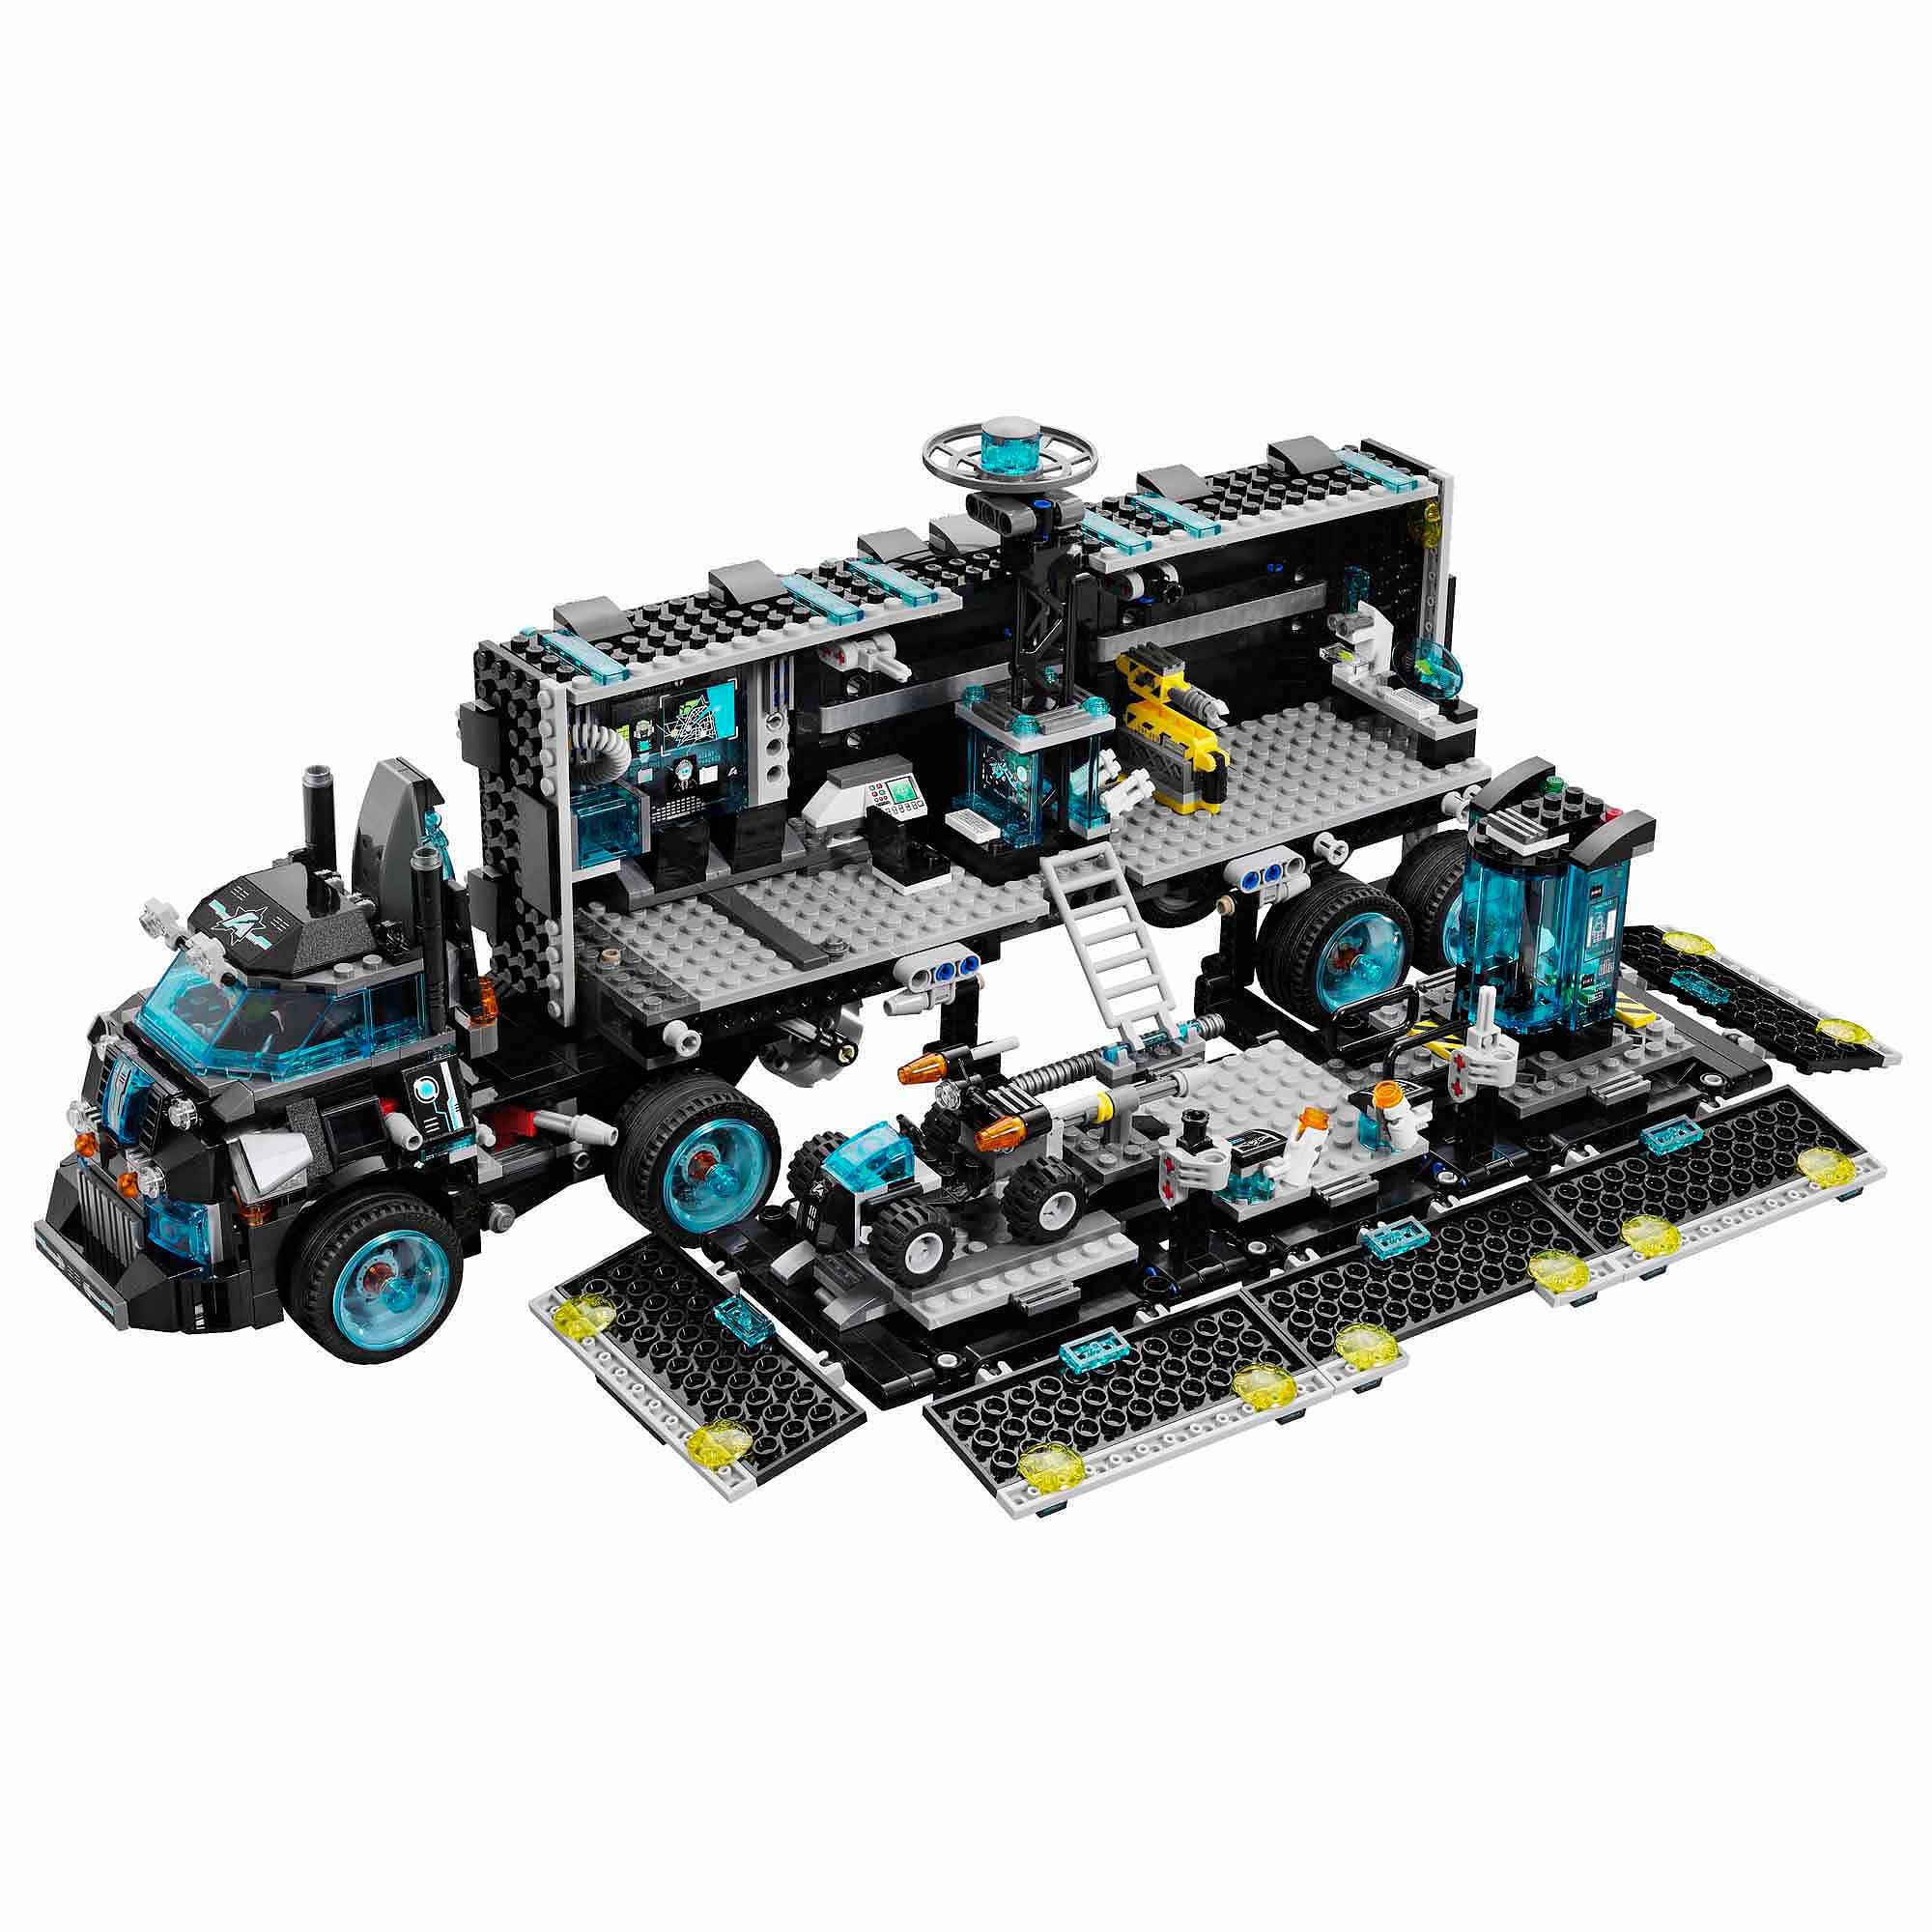 LEGO Agents Ultra Agents Mission HQ - Walmart.com | 450 x 450 jpeg 37kB